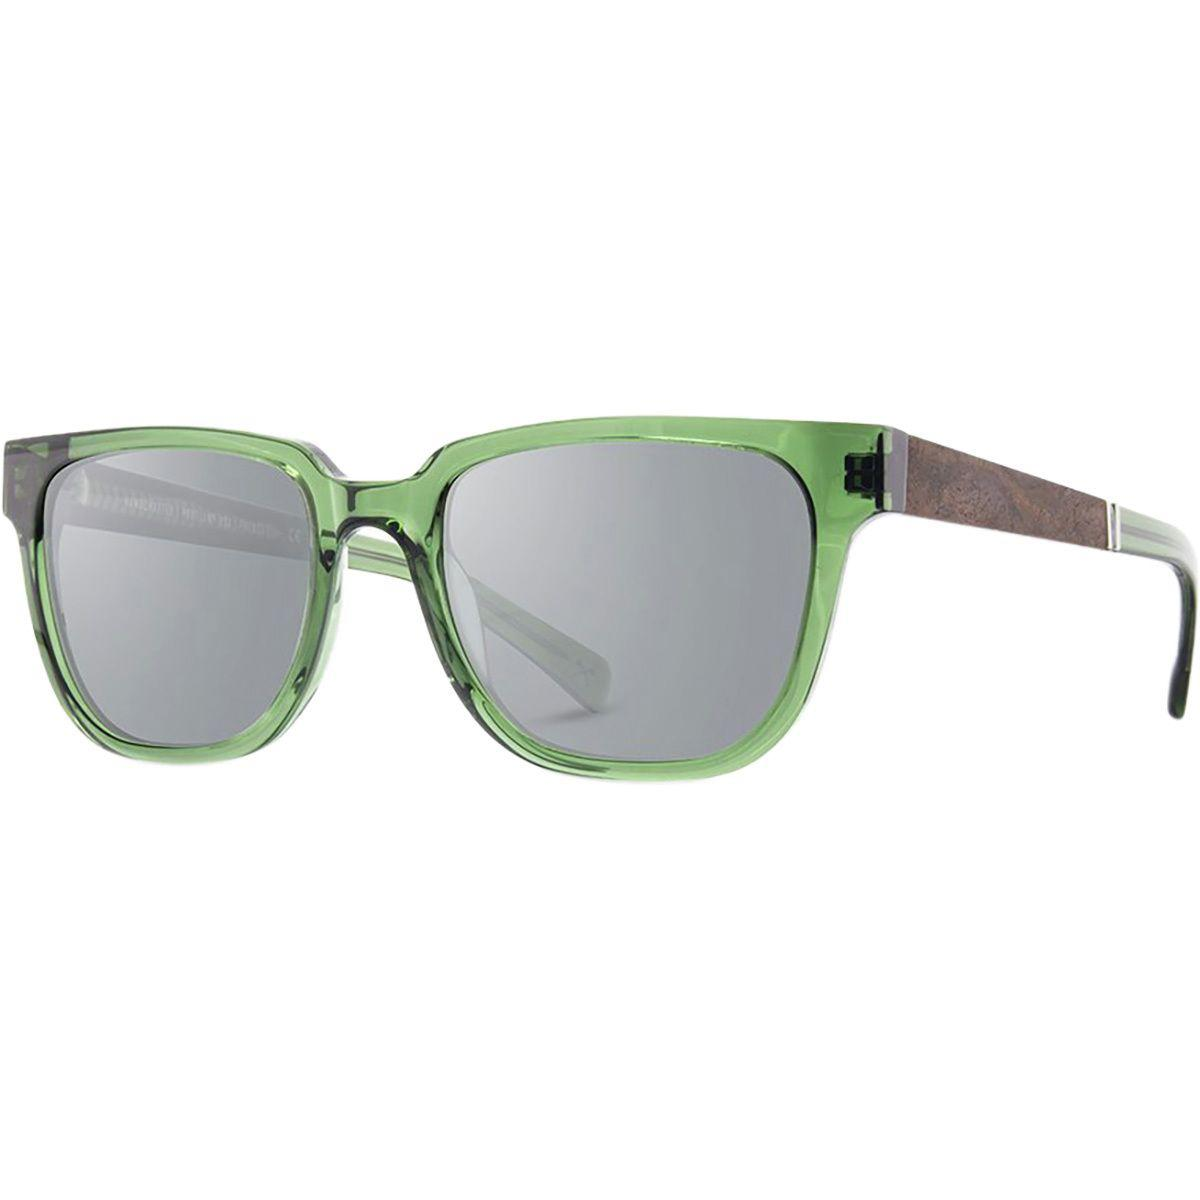 fb2f1ecae281 Lyst - Shwood Prescott Polarized Sunglasses in Gray for Men